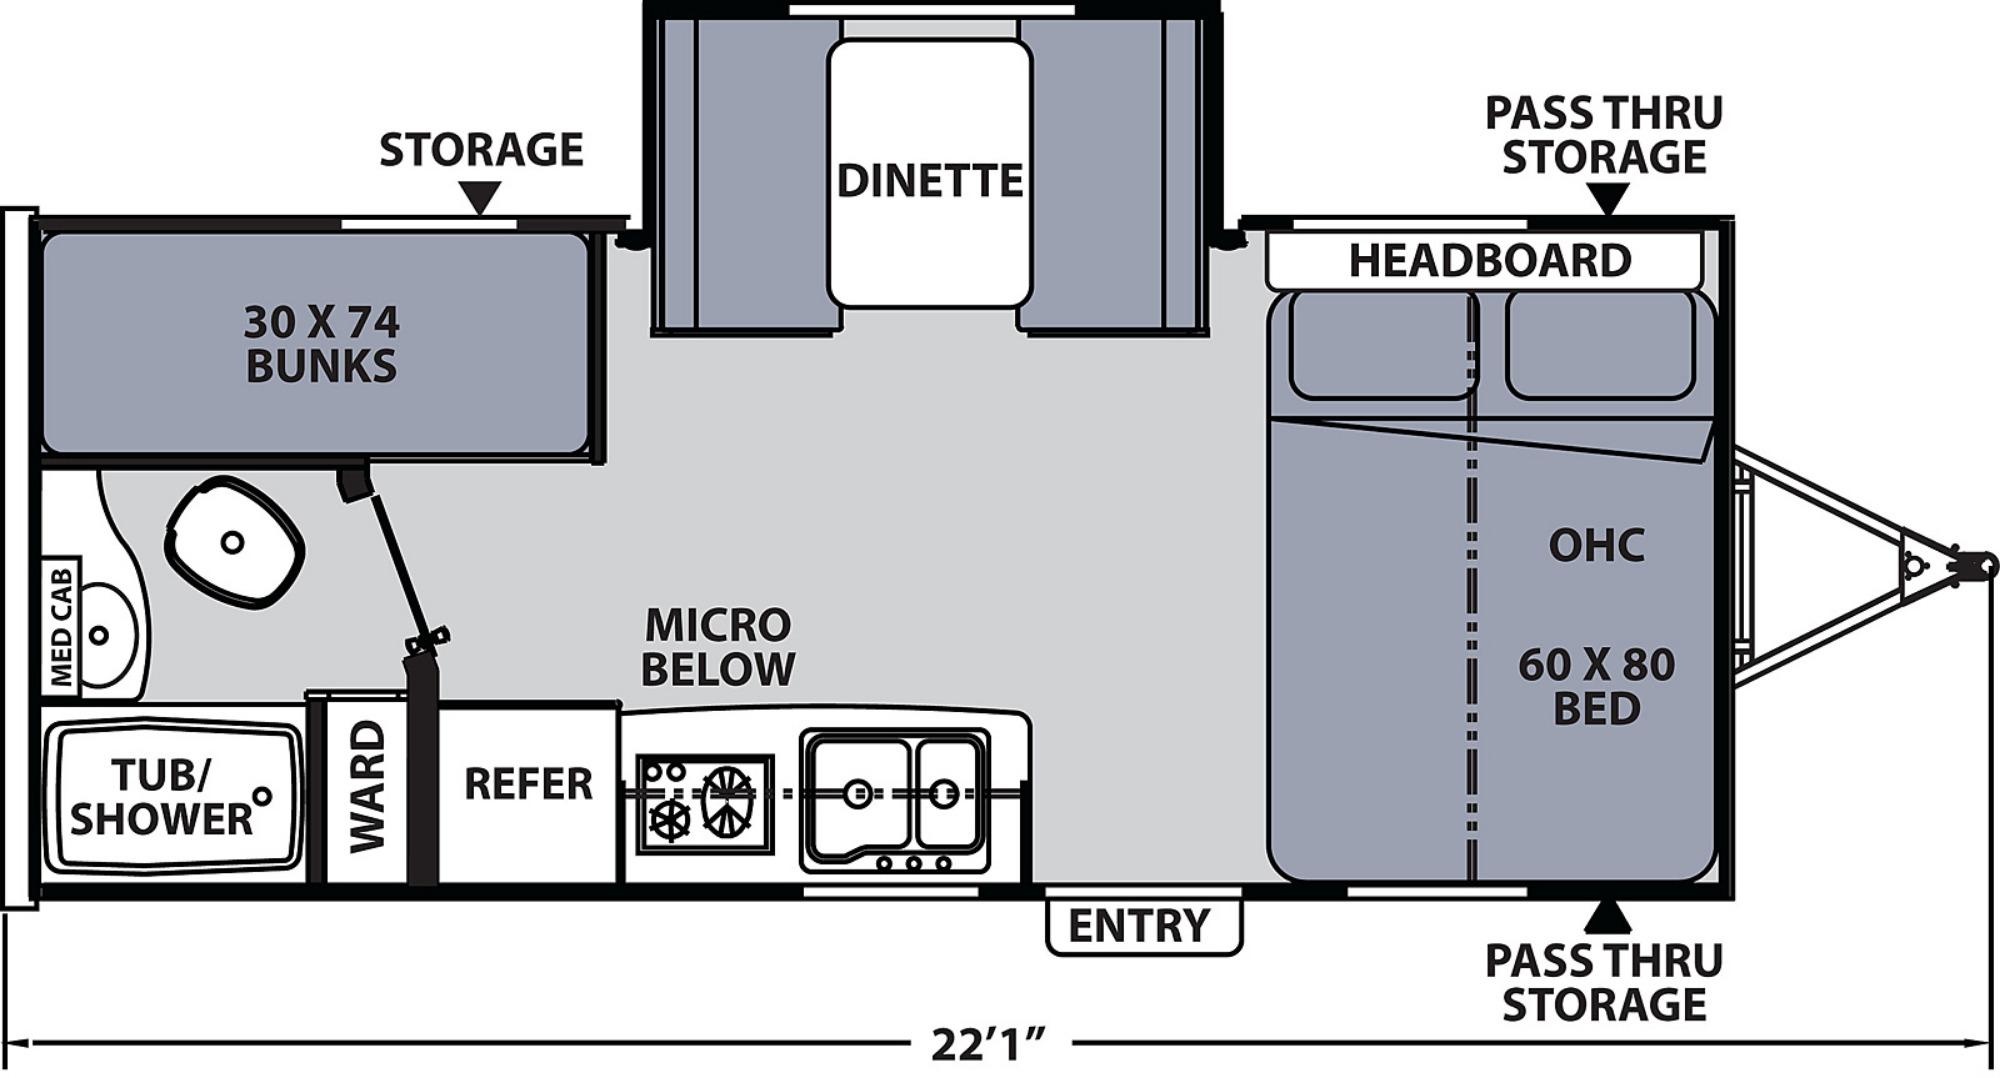 View Floor Plan for 2020 COACHMEN APEX NANO 193BHS